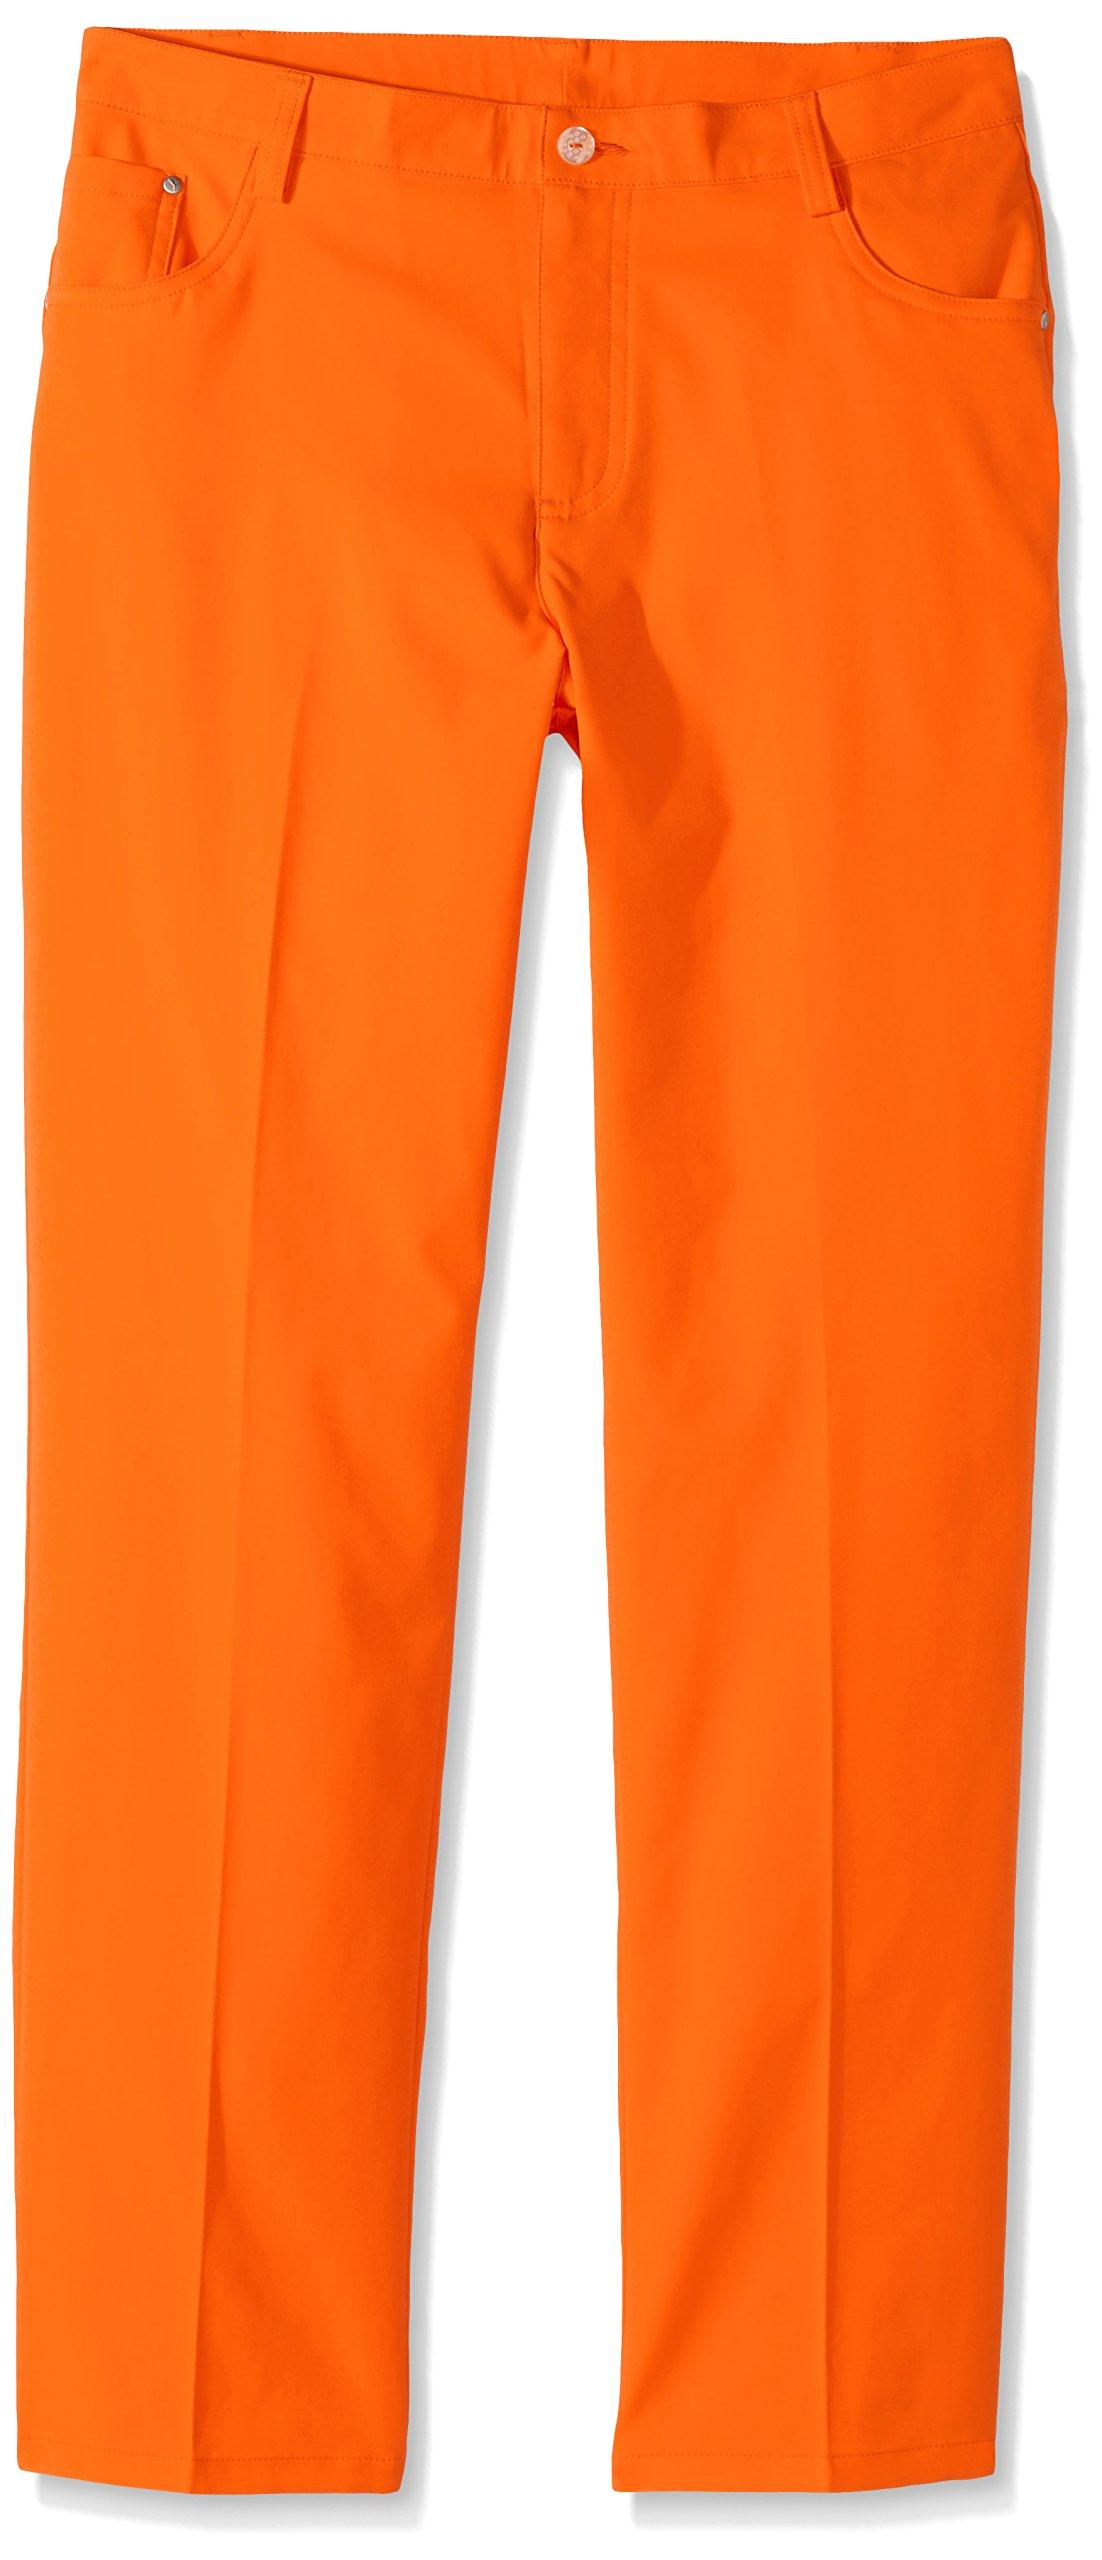 PUMA Boy's Golf Boys 5 Pocket Pants Jr, Orange, X-Large by PUMA